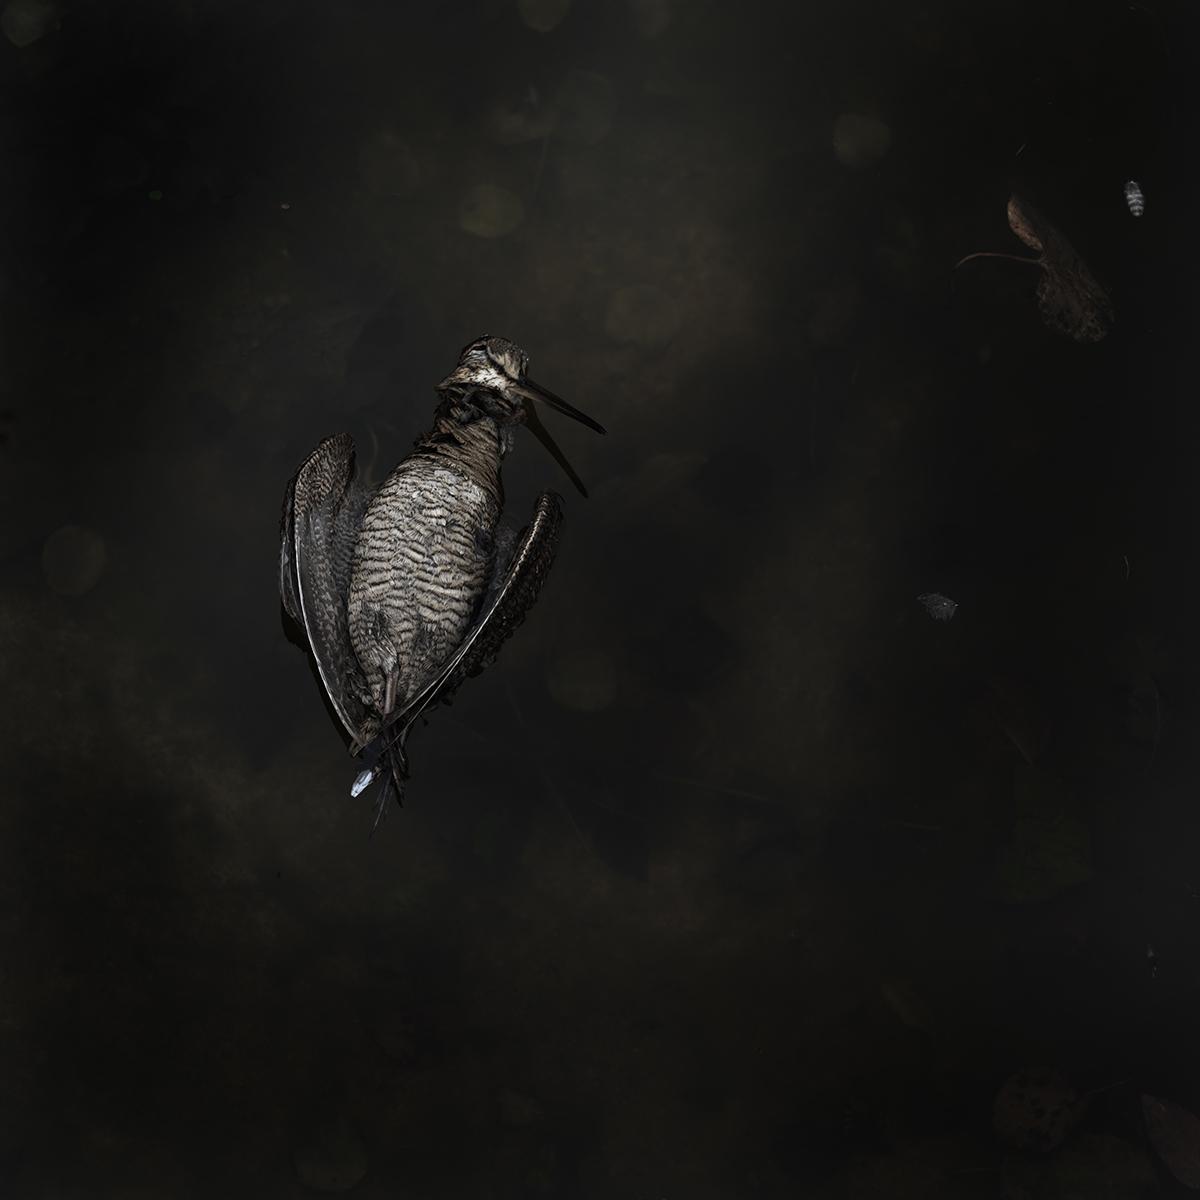 Bird no 5